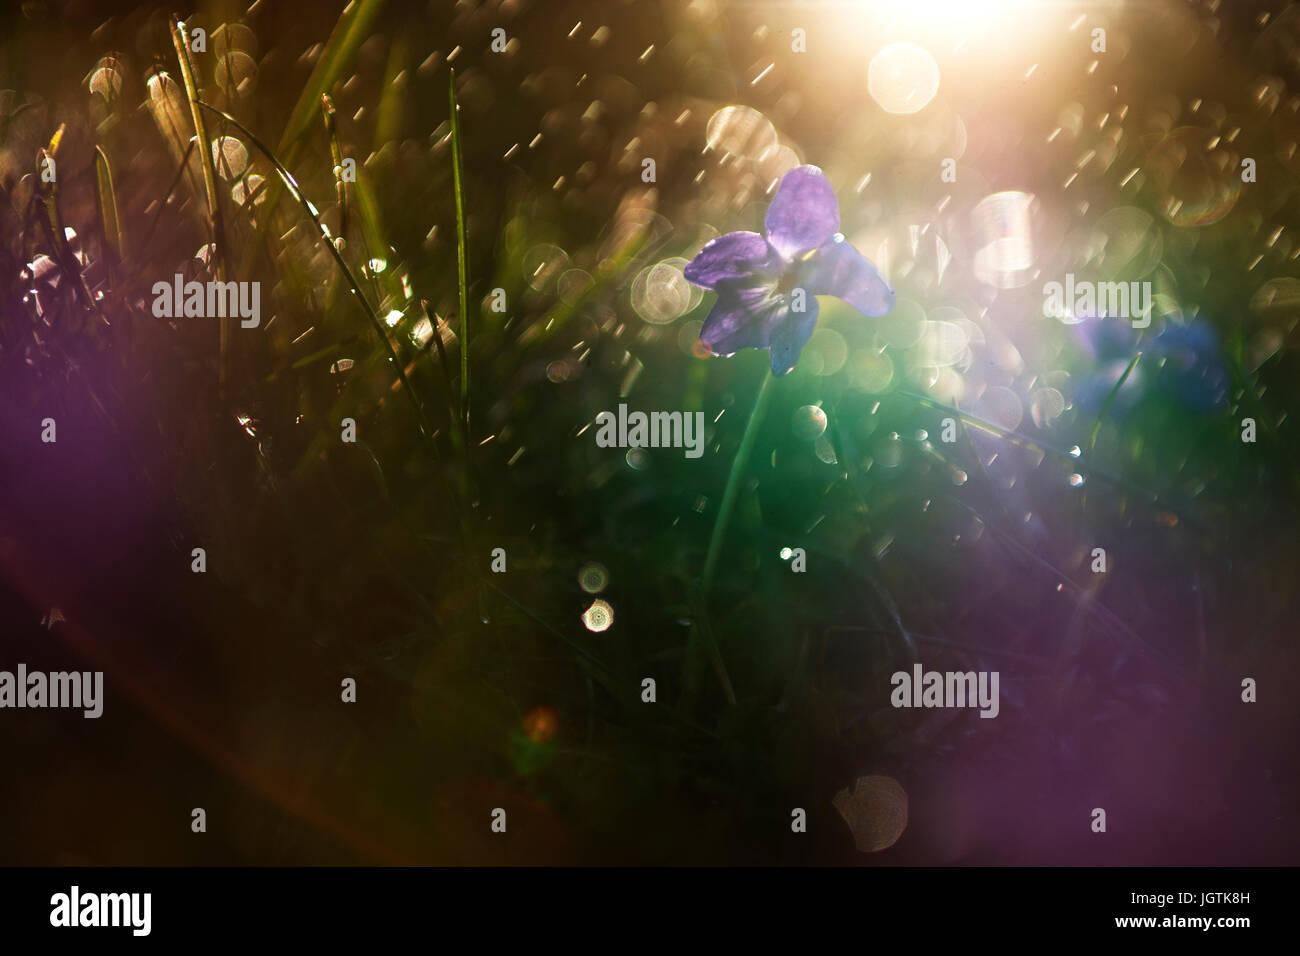 Violet flower in rain - Stock Image